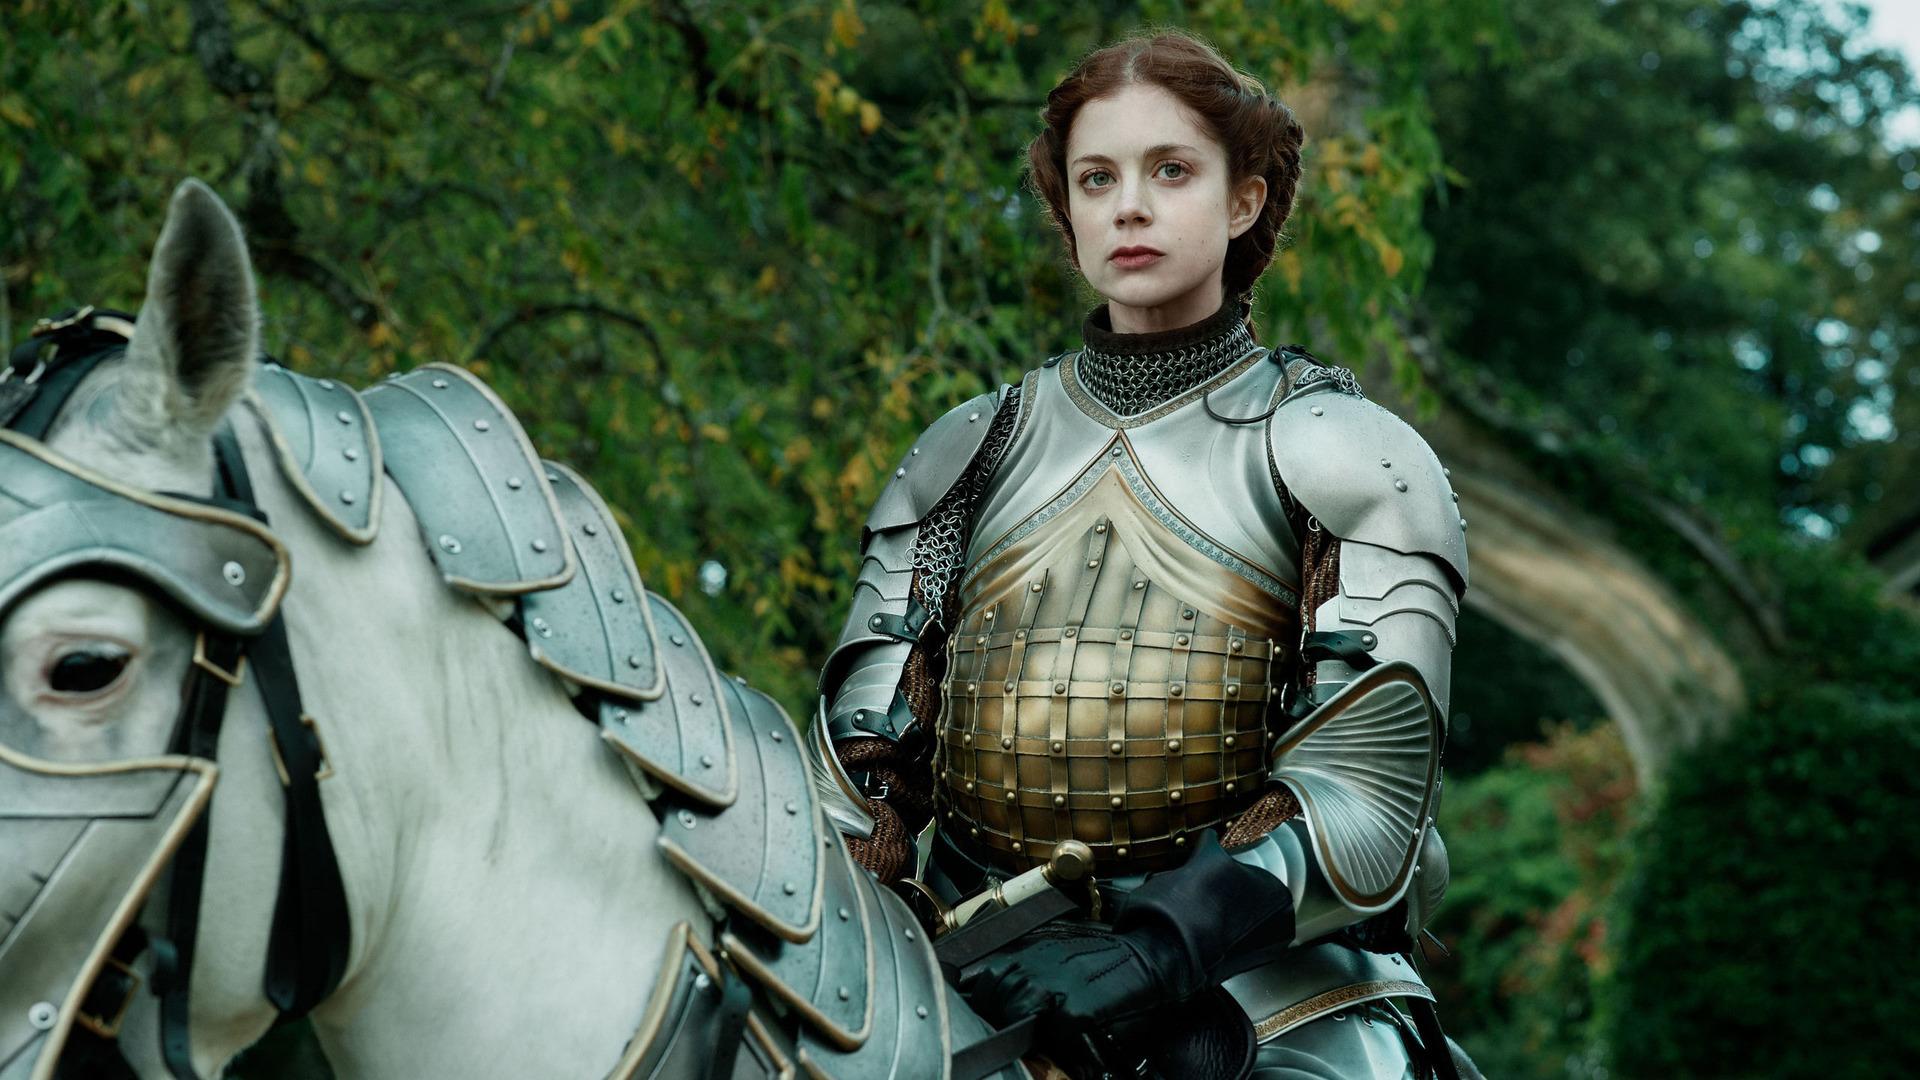 Испанская принцесса — s02e02 — Flodden